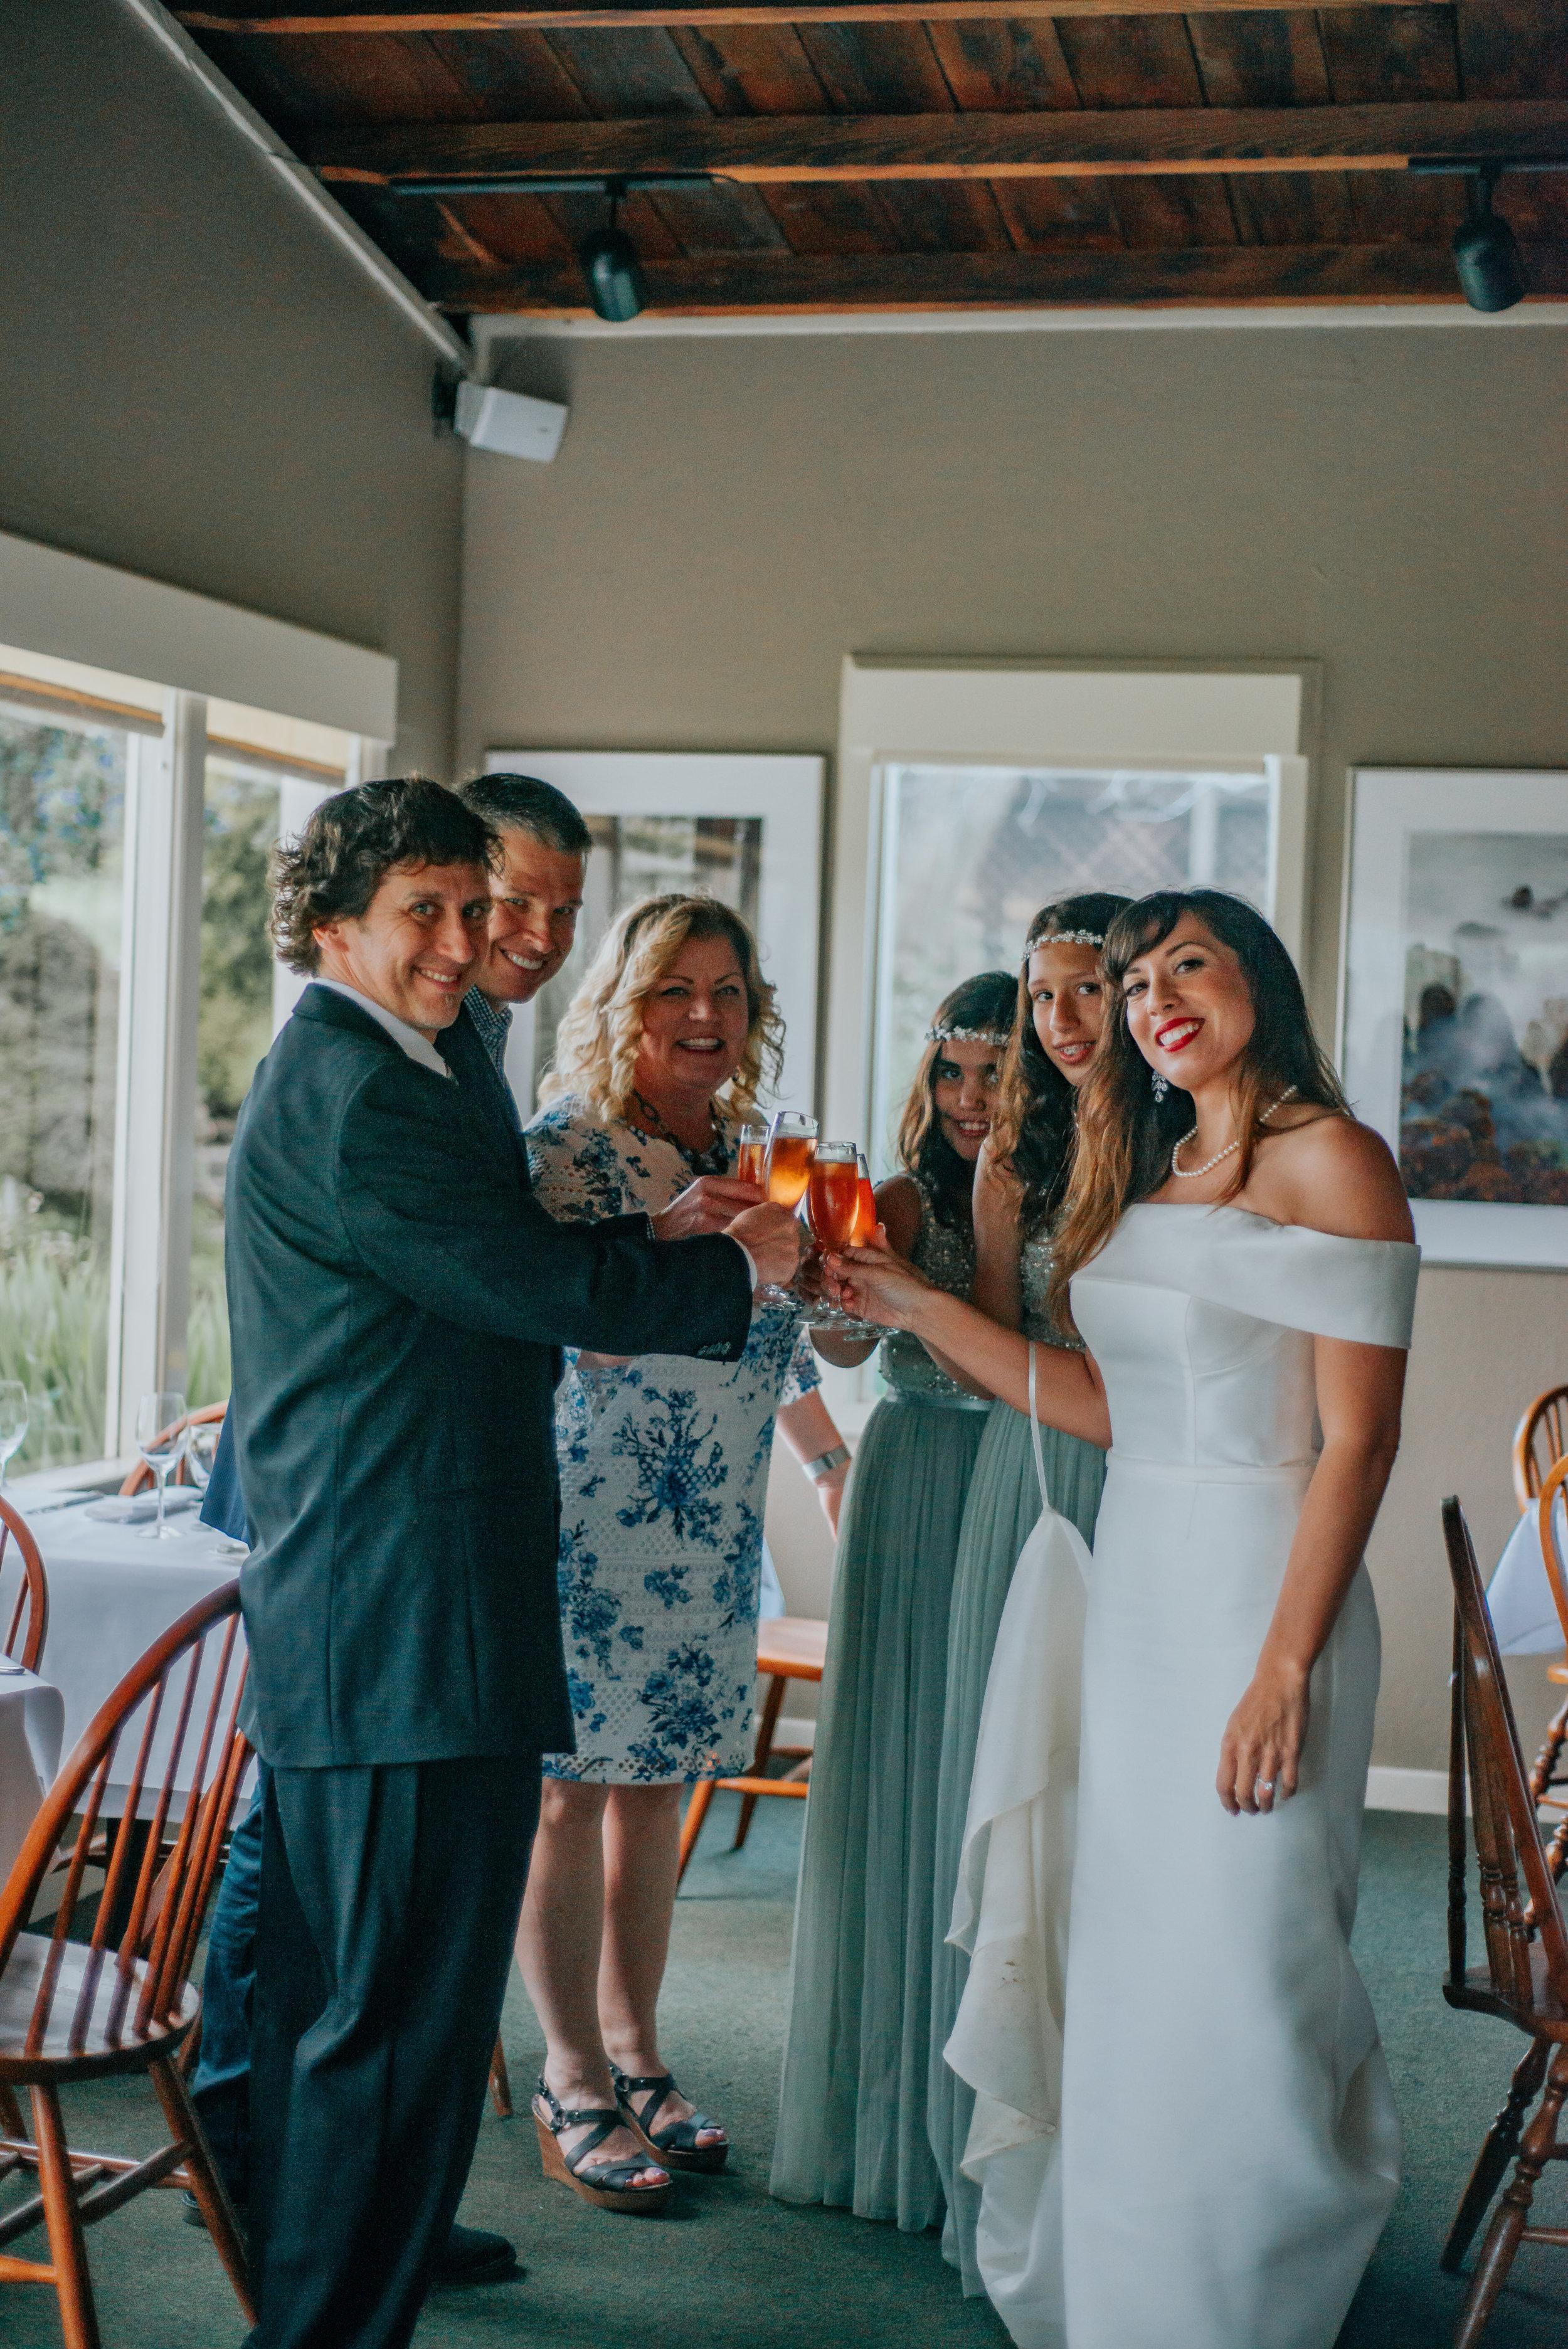 Albion River Inn Wedding in Albion Caliornia-101.jpg